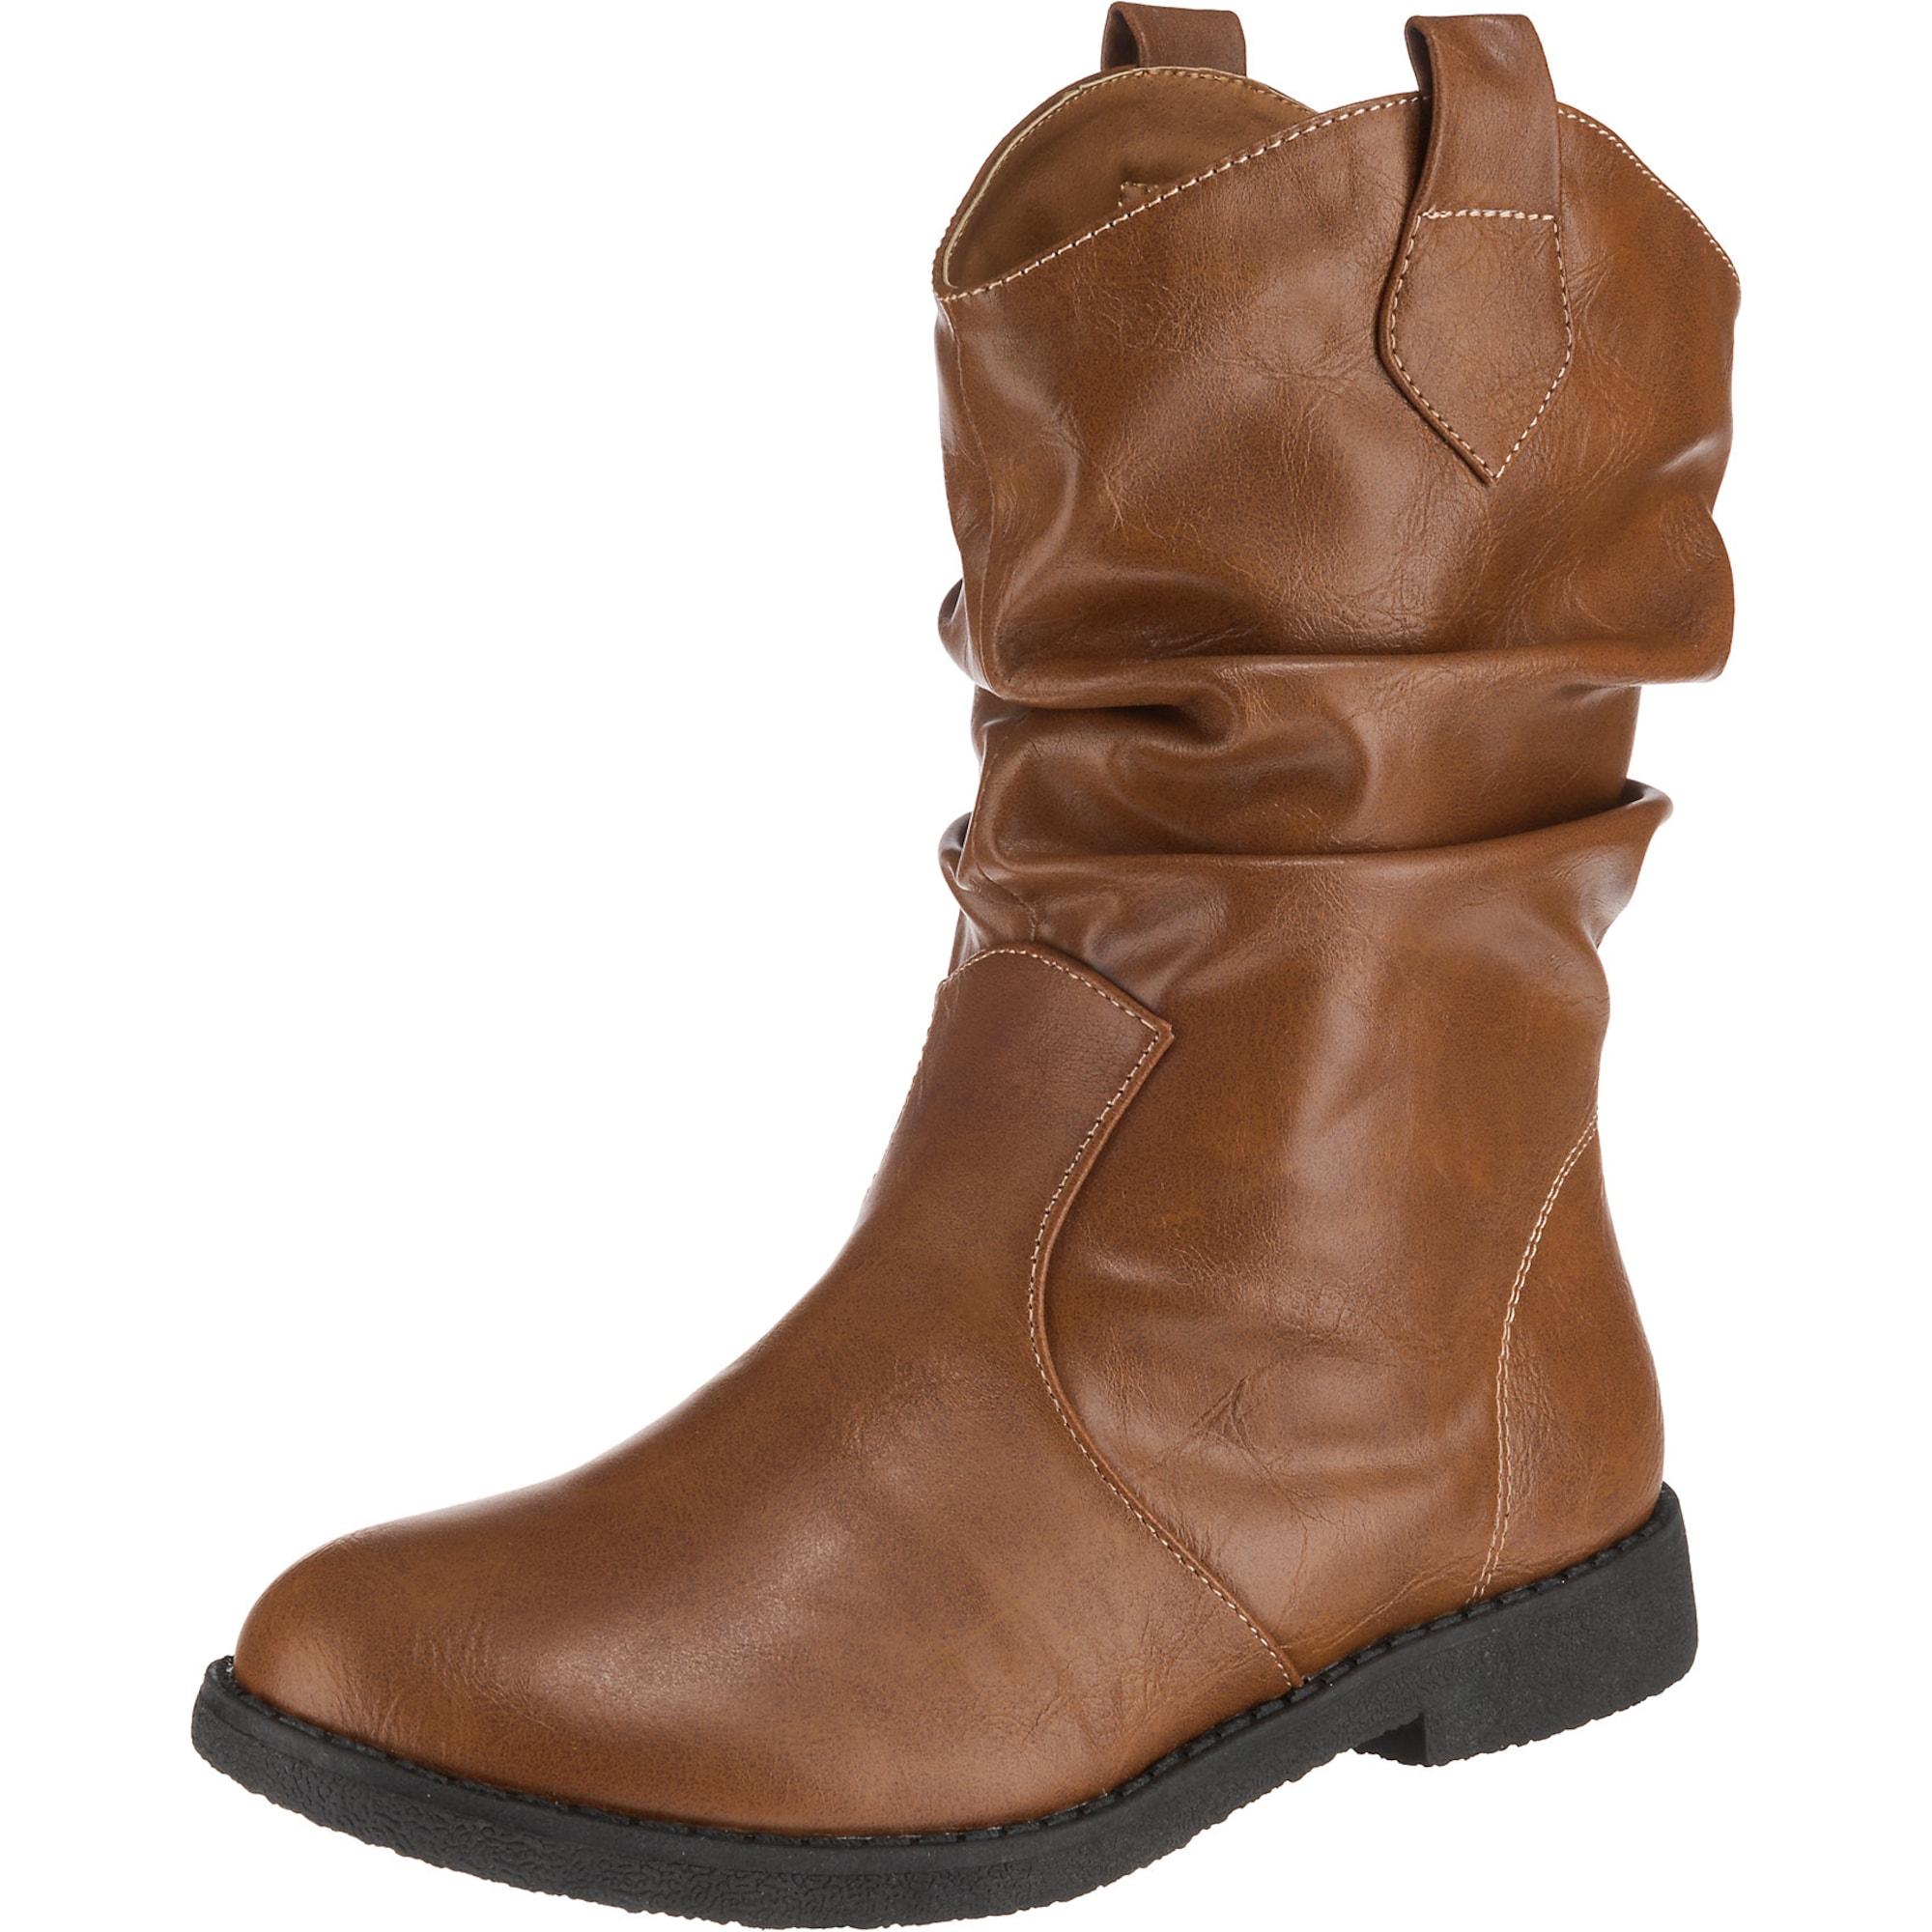 Winterstiefeletten | Schuhe > Stiefeletten > Winterstiefeletten | Braun | UNLIMITED